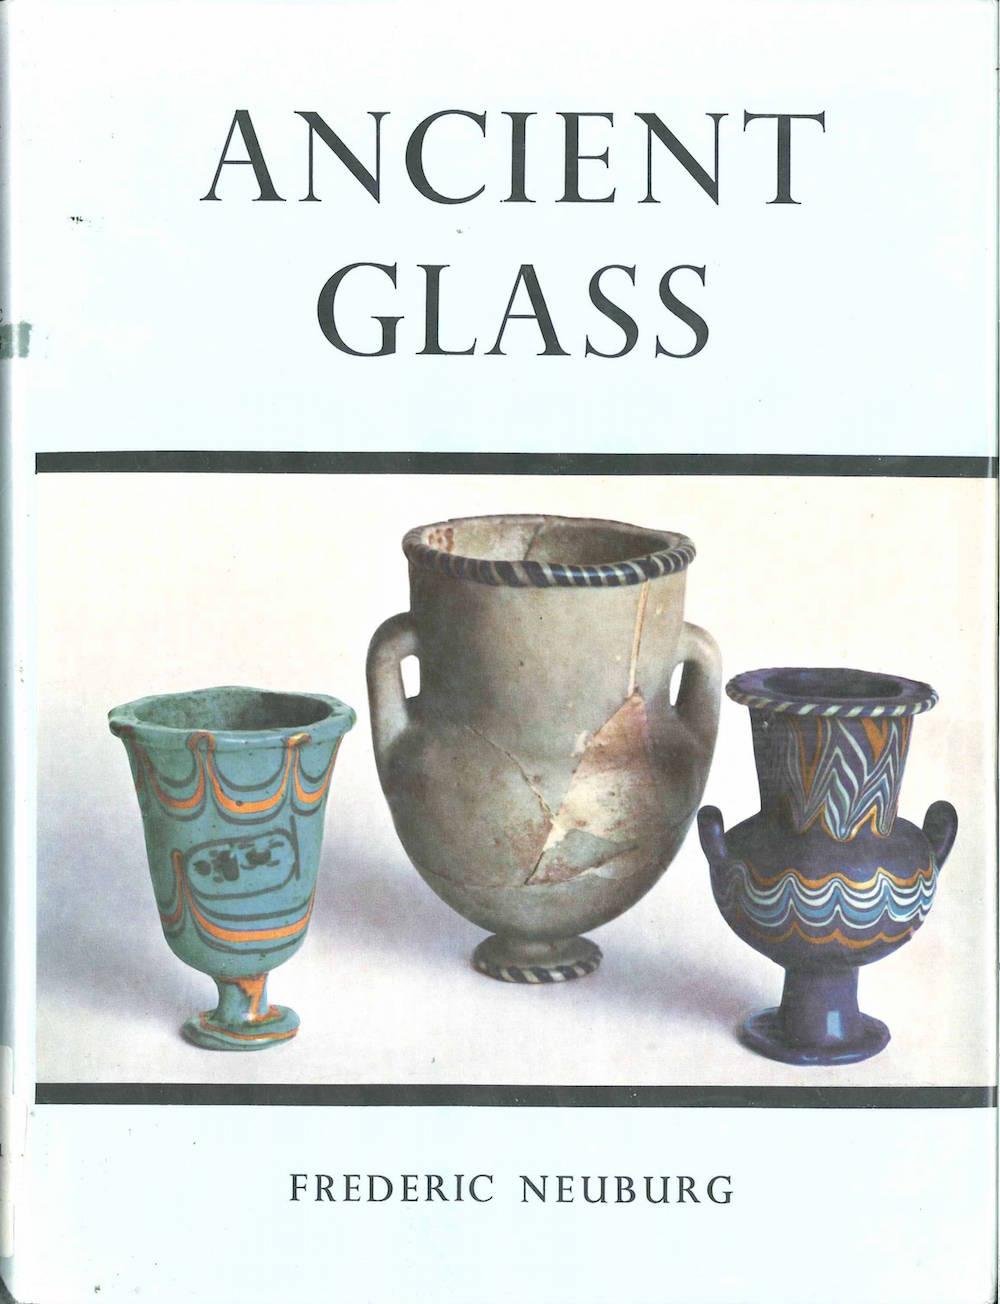 AncientGlassCover